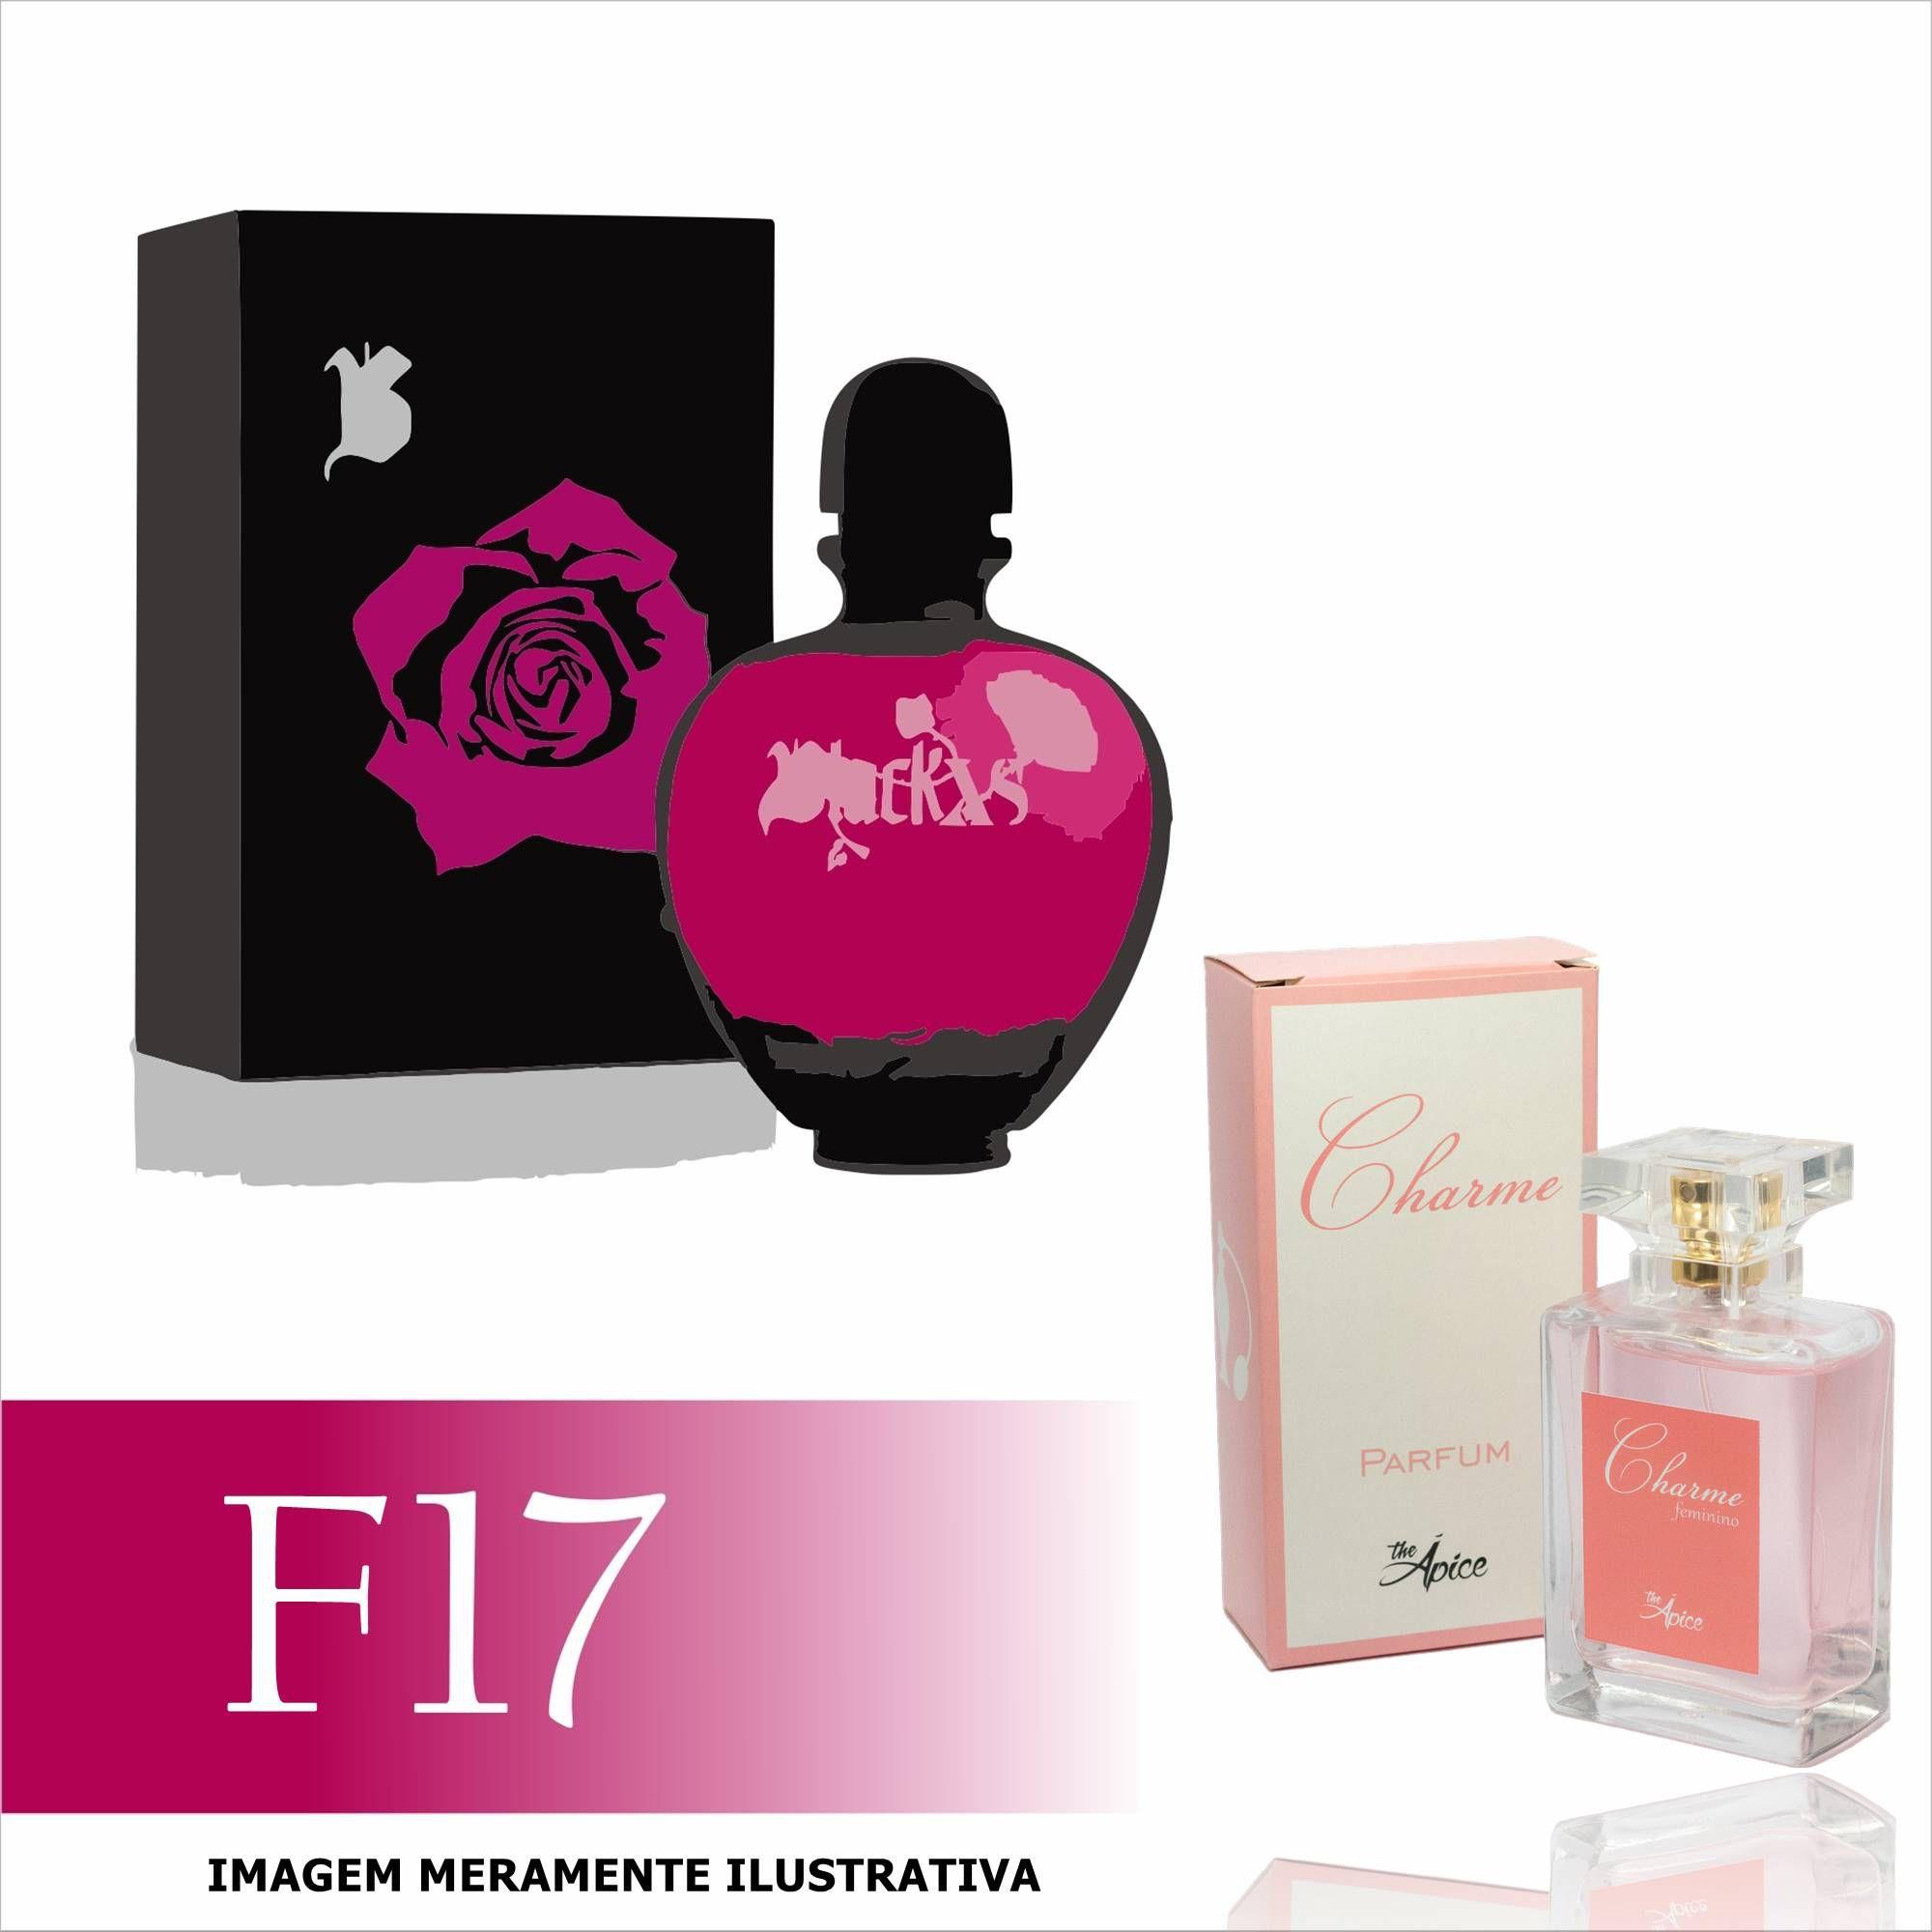 Perfume F17 Inspirado no Black XS da Paco Rabanne Feminino